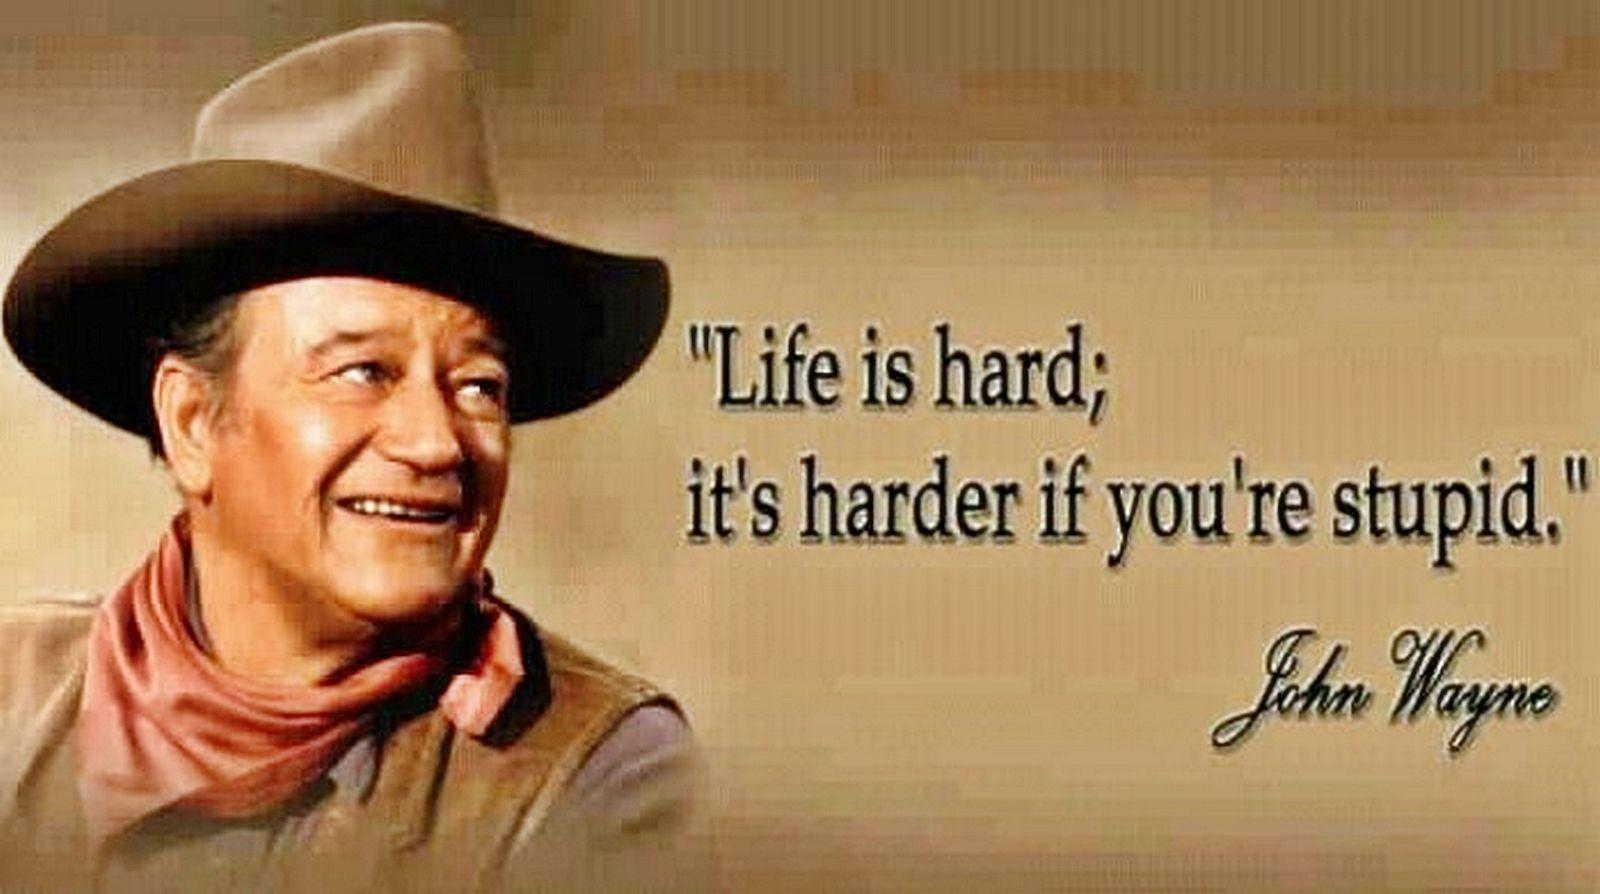 John Wayne Quotes Desktop Wallpaper Quotesgram 3 Quotes